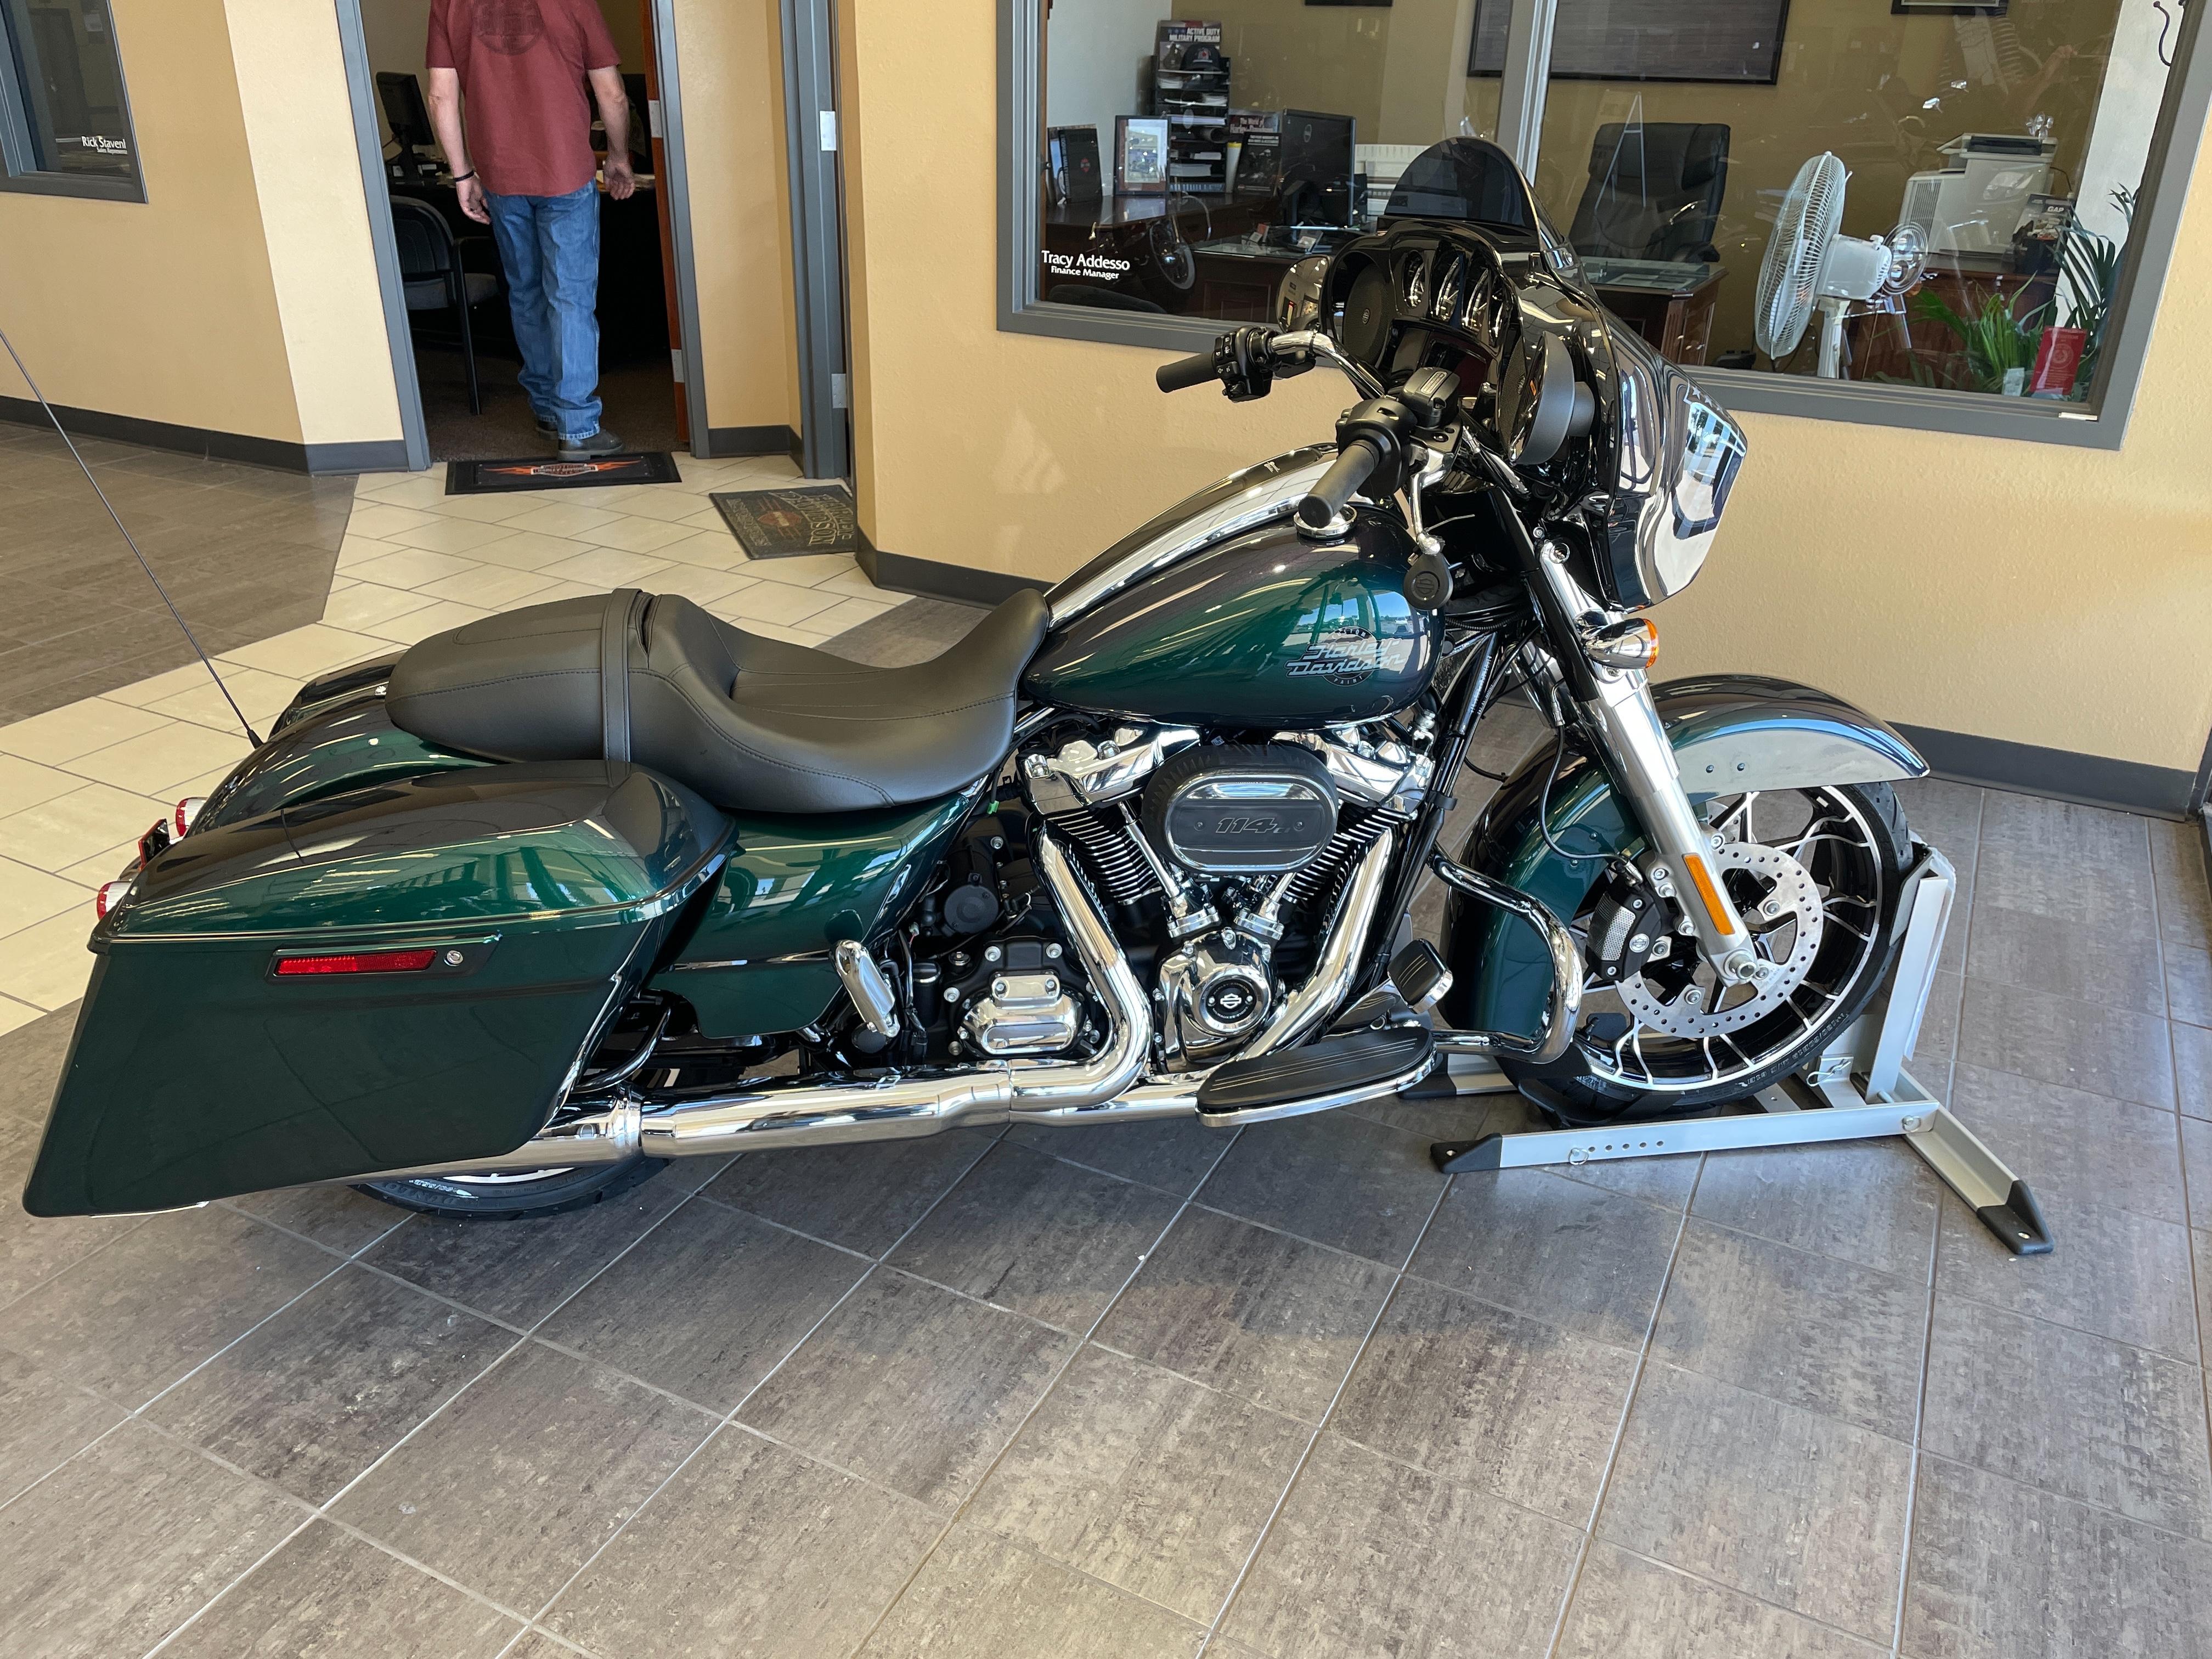 2021 Harley-Davidson Street Glide Special Street Glide Special at Tripp's Harley-Davidson